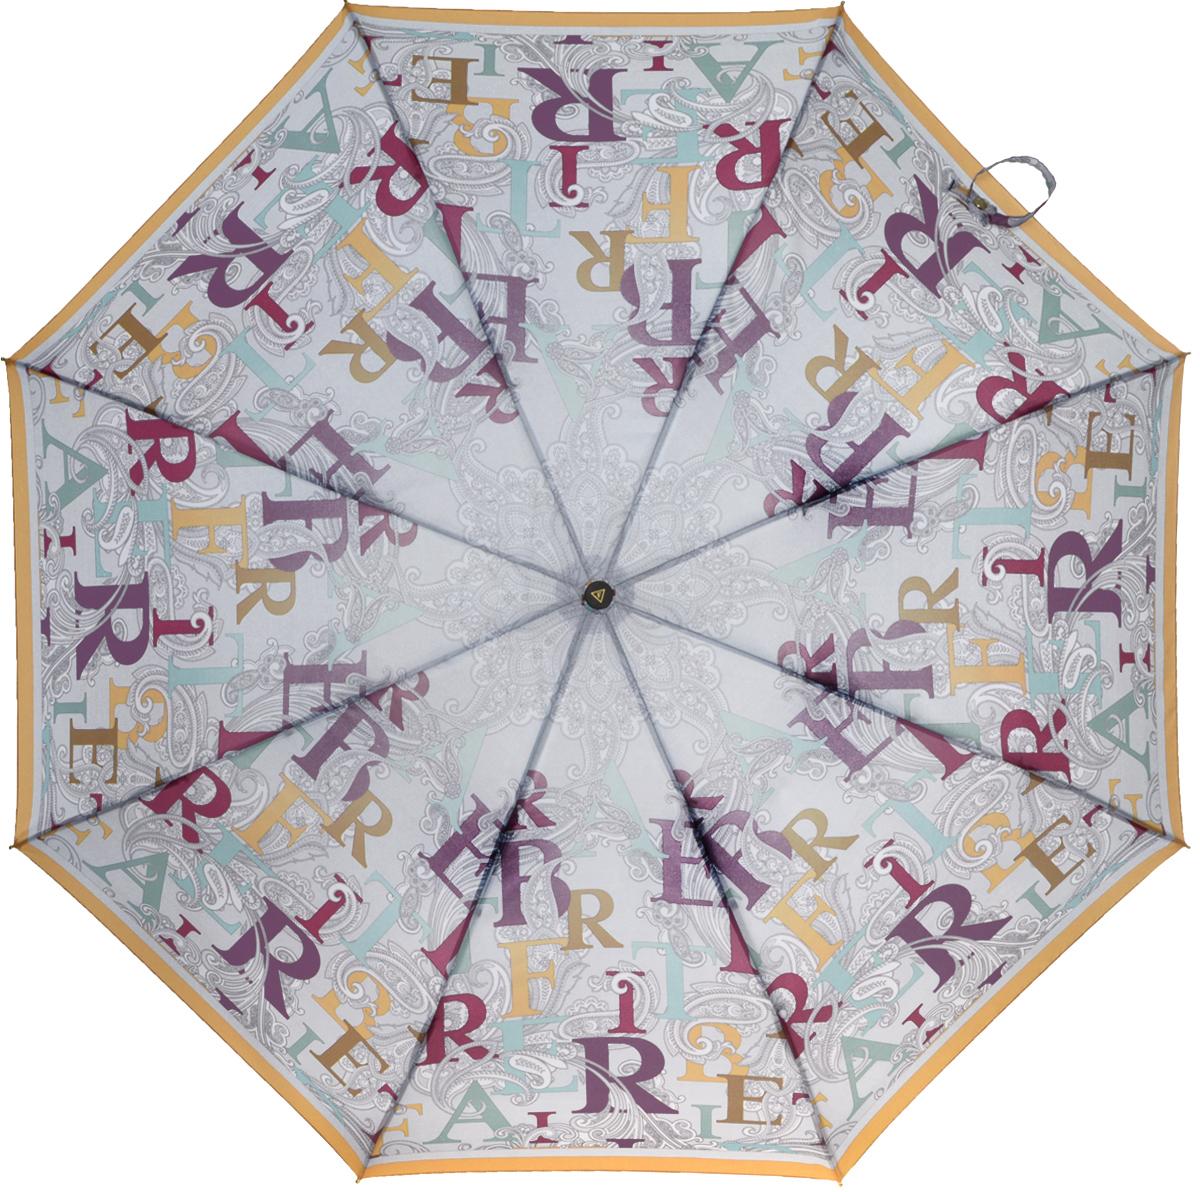 Зонт женский Fabretti, автомат, 3 сложения, цвет: мультиколор. L-16103-2L-16103-2Зонт женский Fabretti, облегченный суперавтомат, 3 сложения